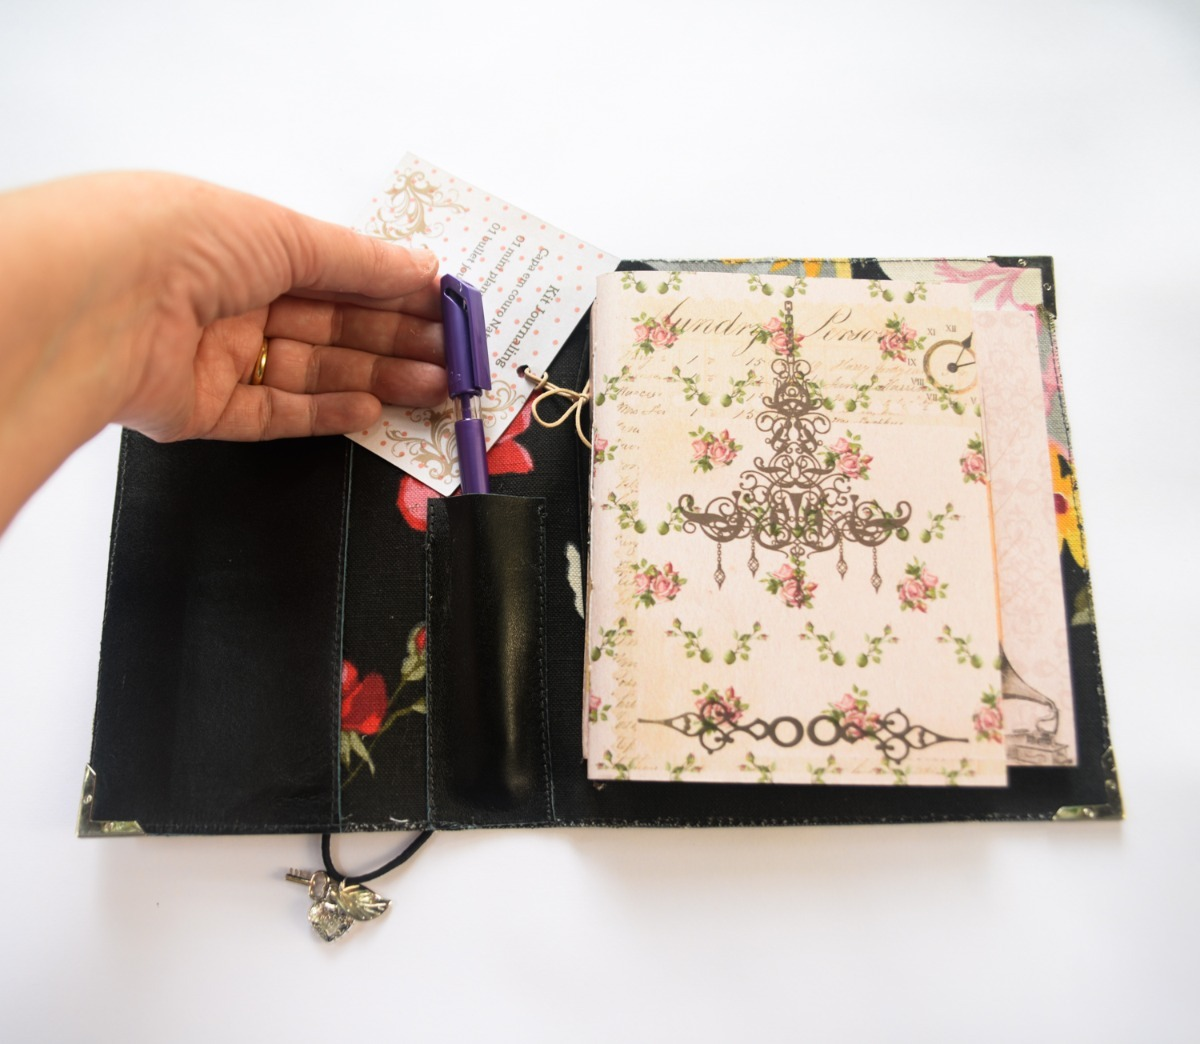 kit journaling mini planner bullet journal r 99 00 em mercado livre. Black Bedroom Furniture Sets. Home Design Ideas